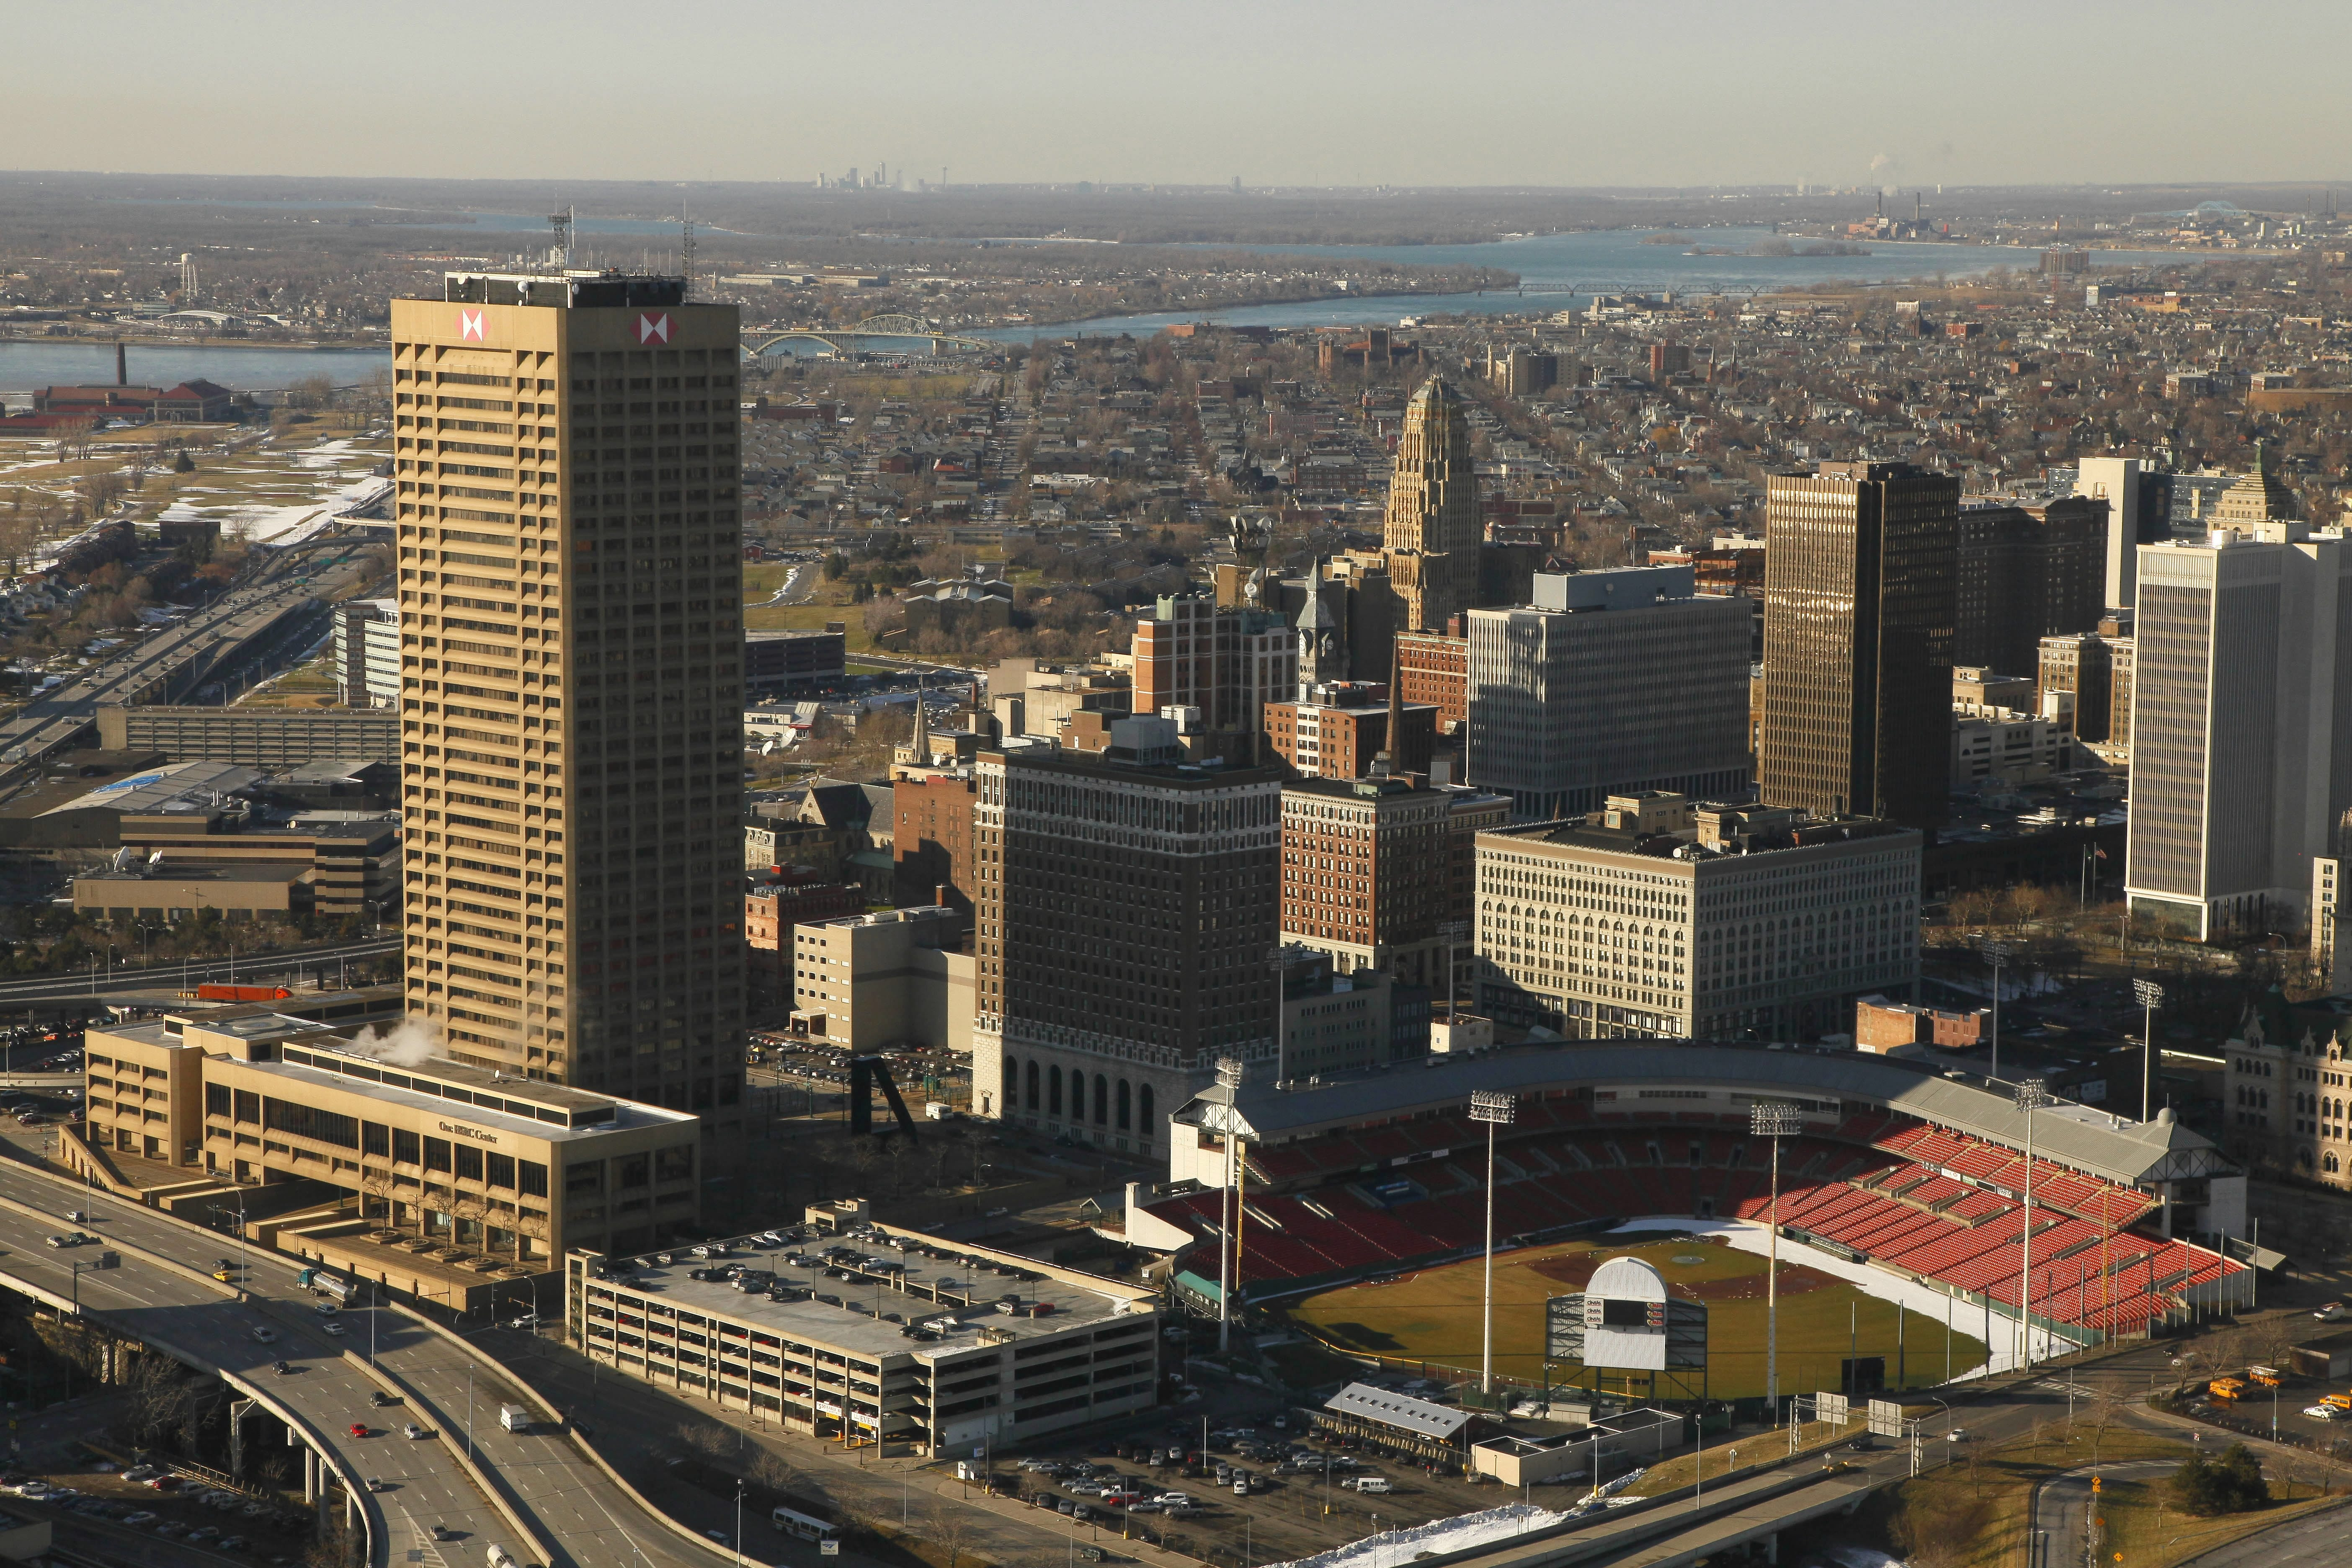 Aerial view of downtown Buffalo. Photo taken Feb. 13, 2009, by Derek Gee